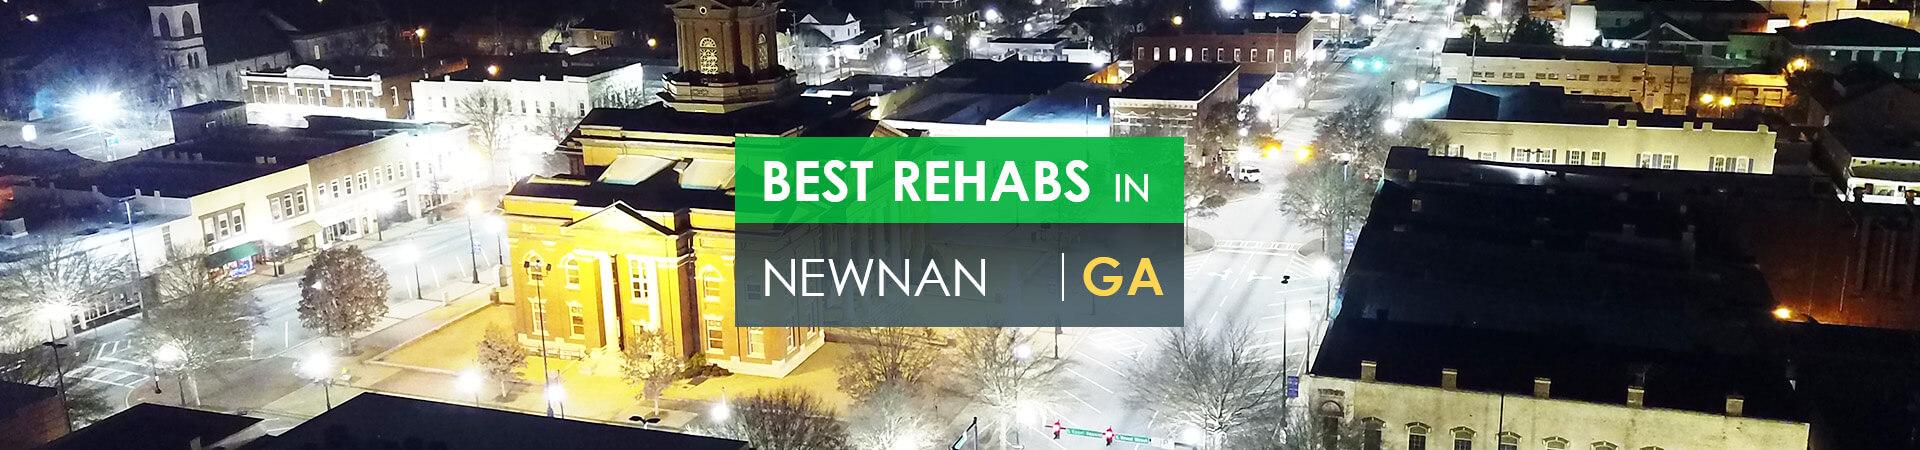 Best rehabs in Newnan, GA